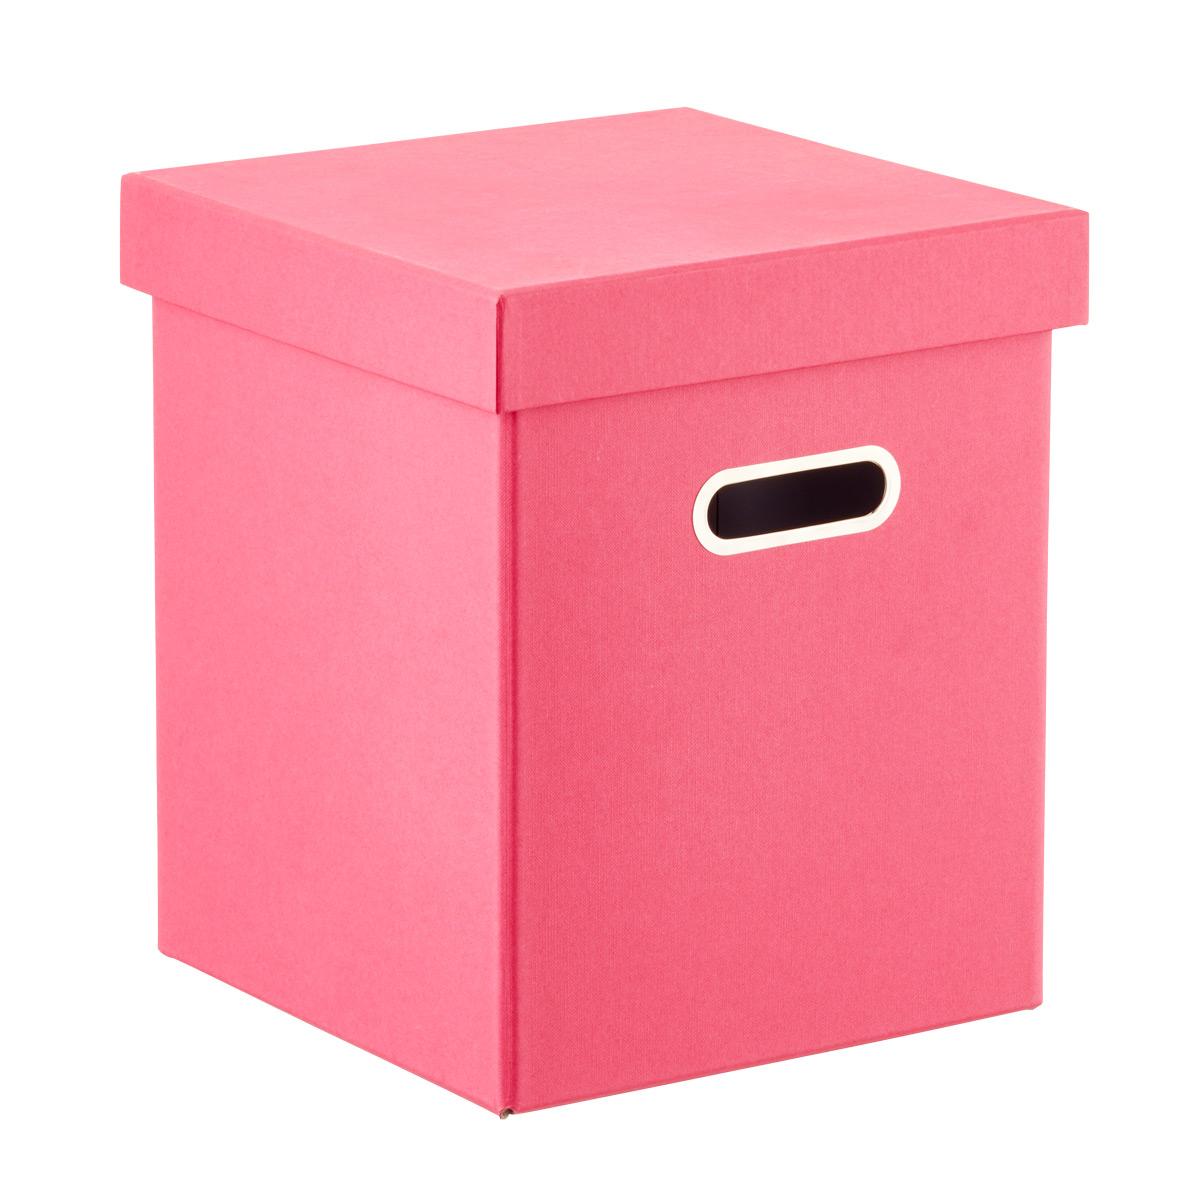 Milo Toy Box Seat